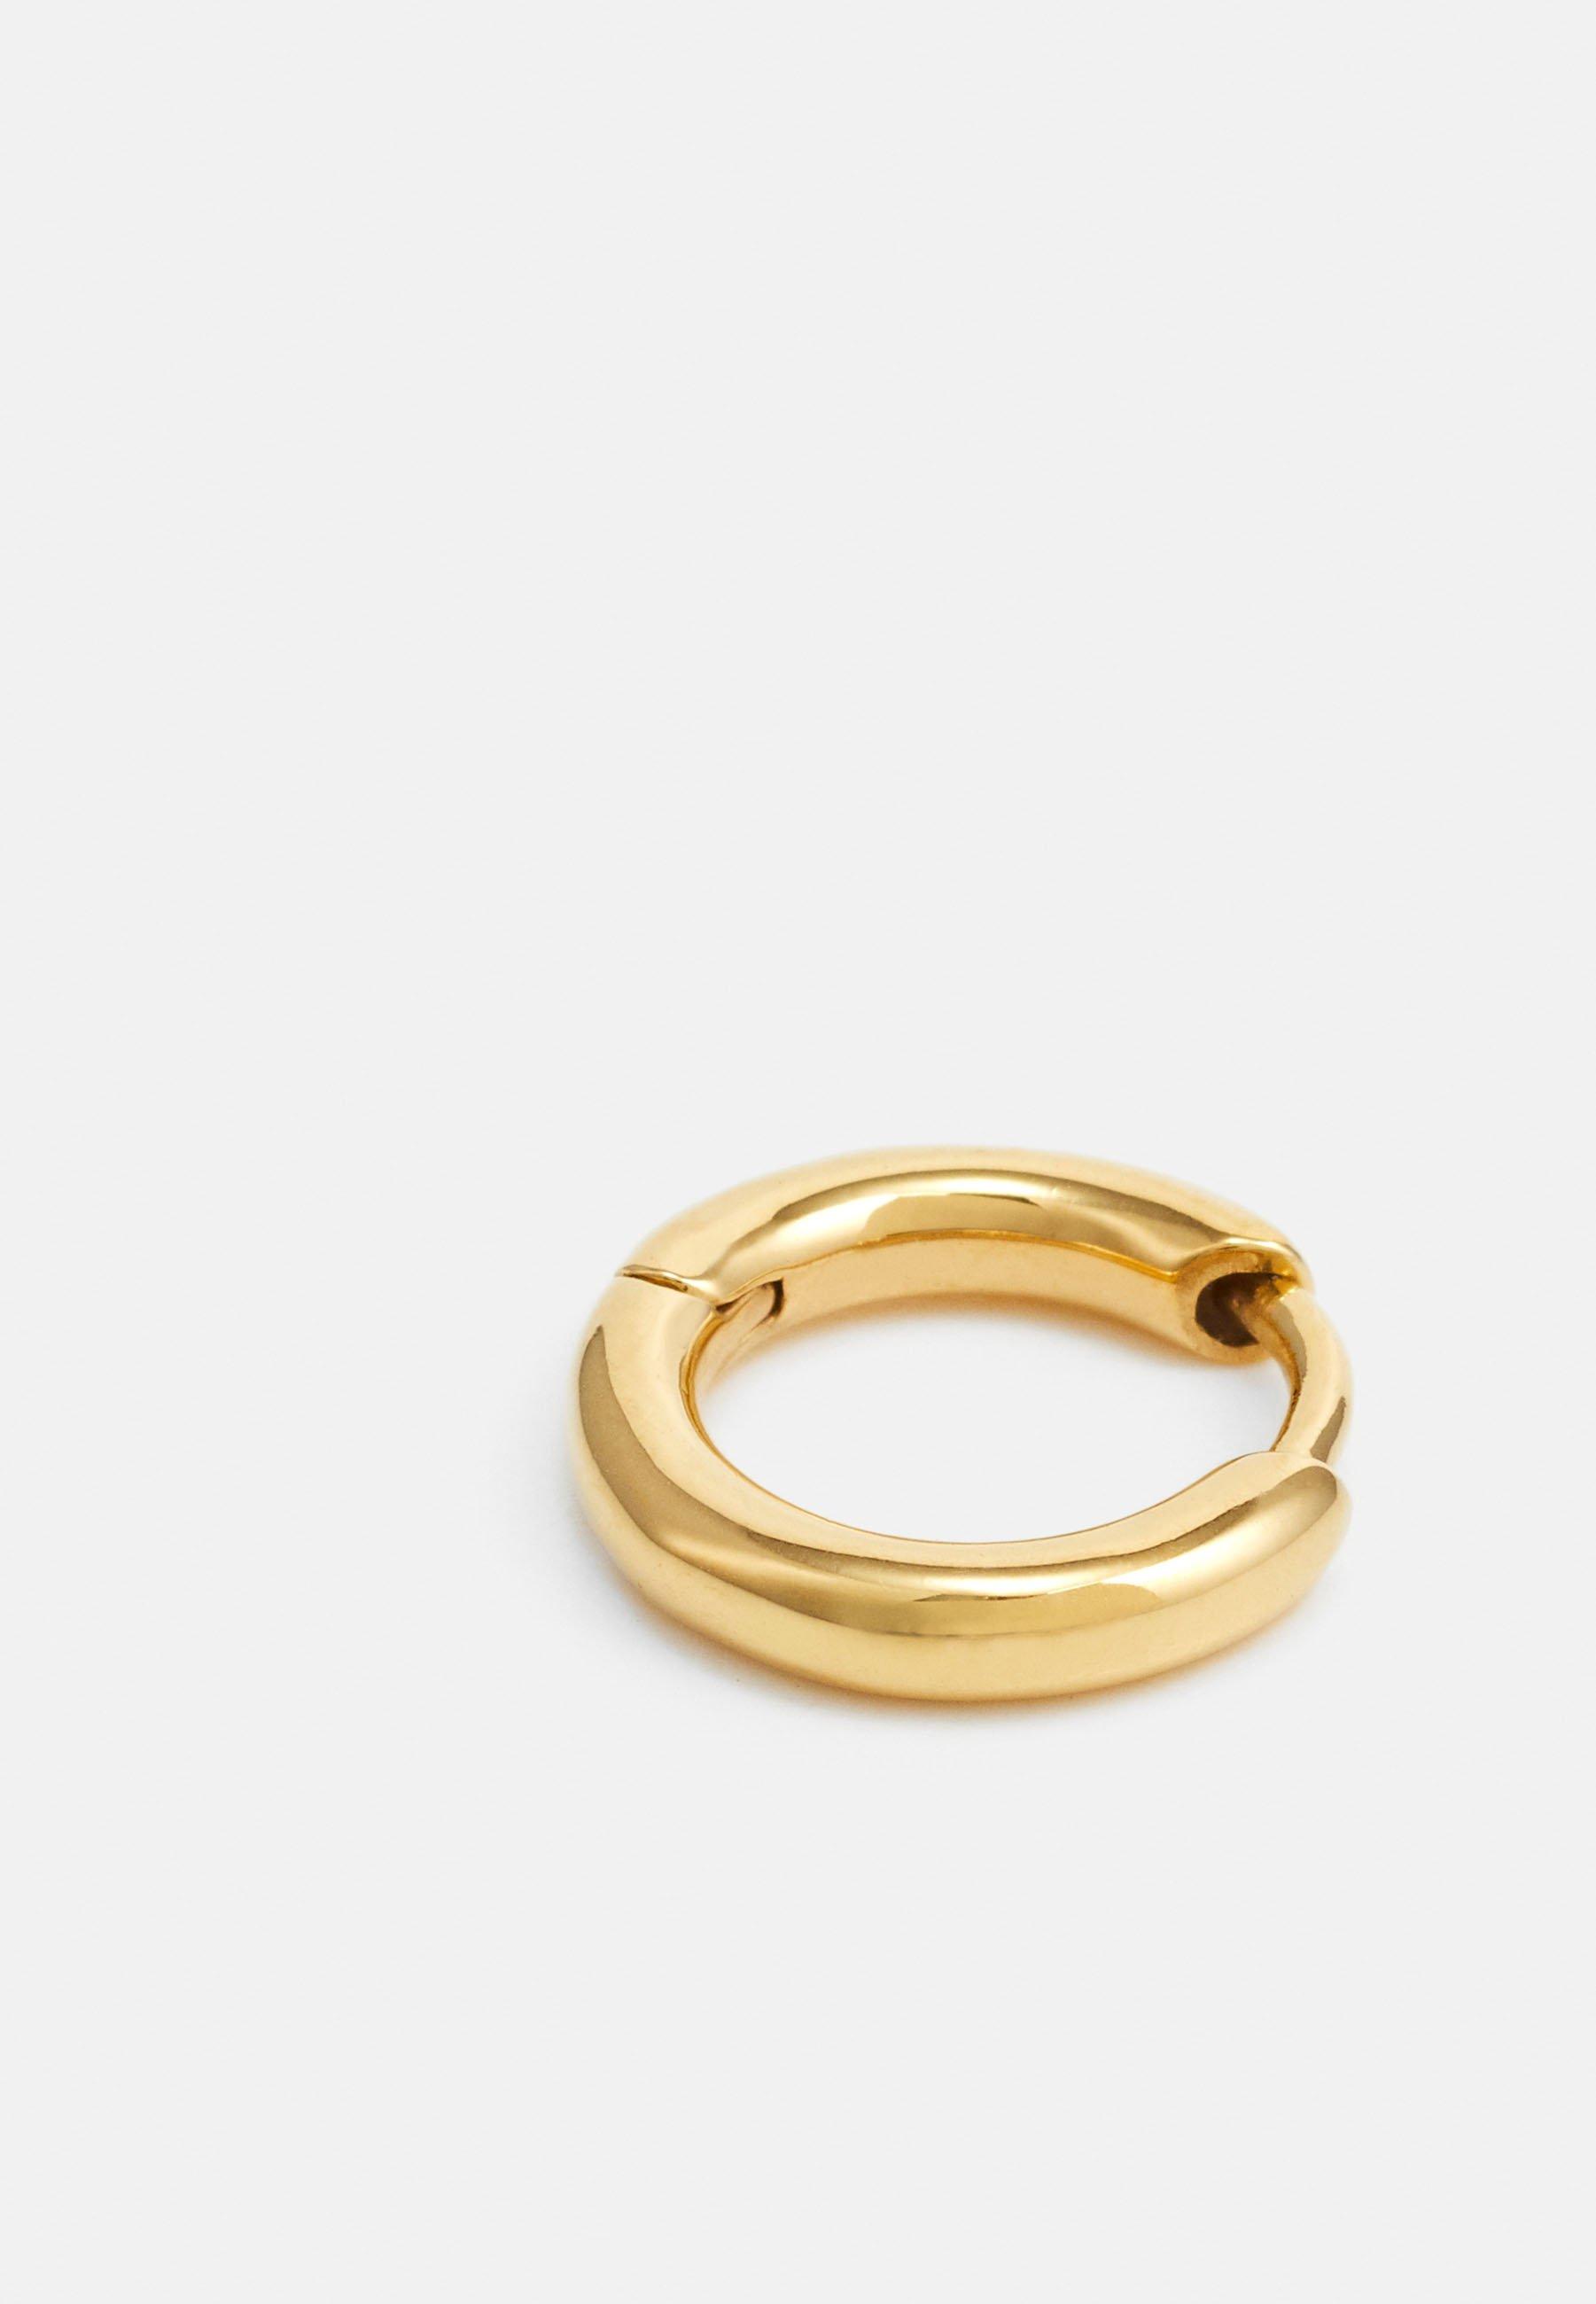 100% Guaranteed Shop For Accessories Maria Black MARCO HUGGIE Earrings gold-coloured FAq8E9tOt ZWy1I2oBh